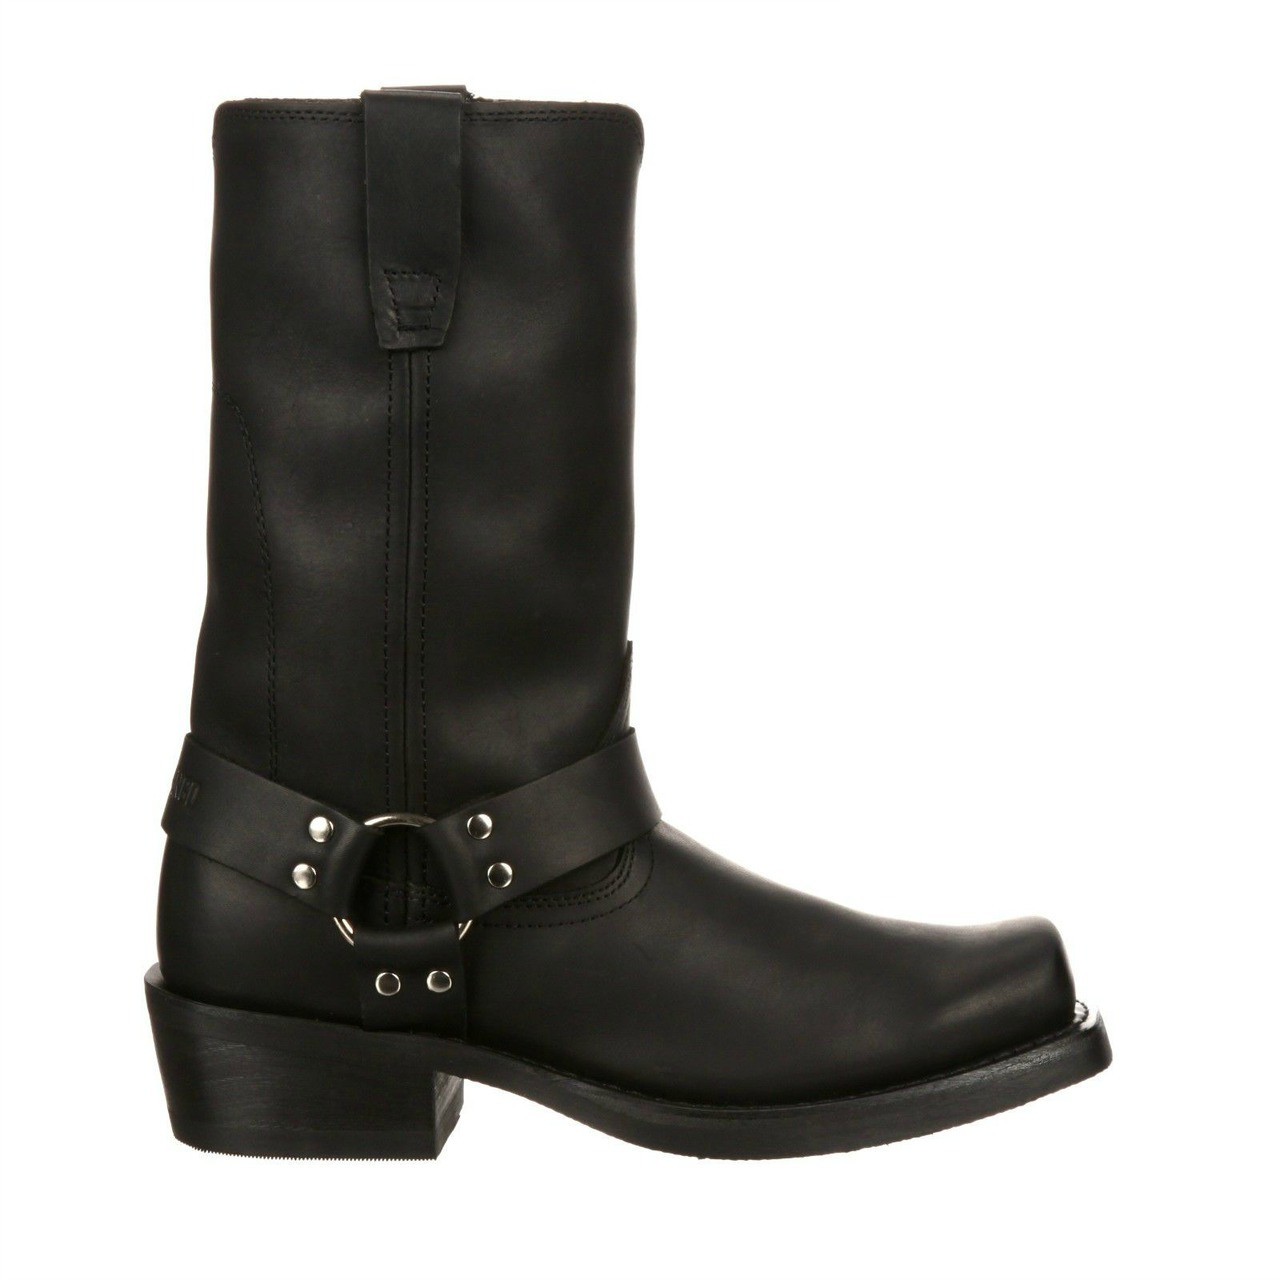 Durango Women's Harness Western Boots RD510